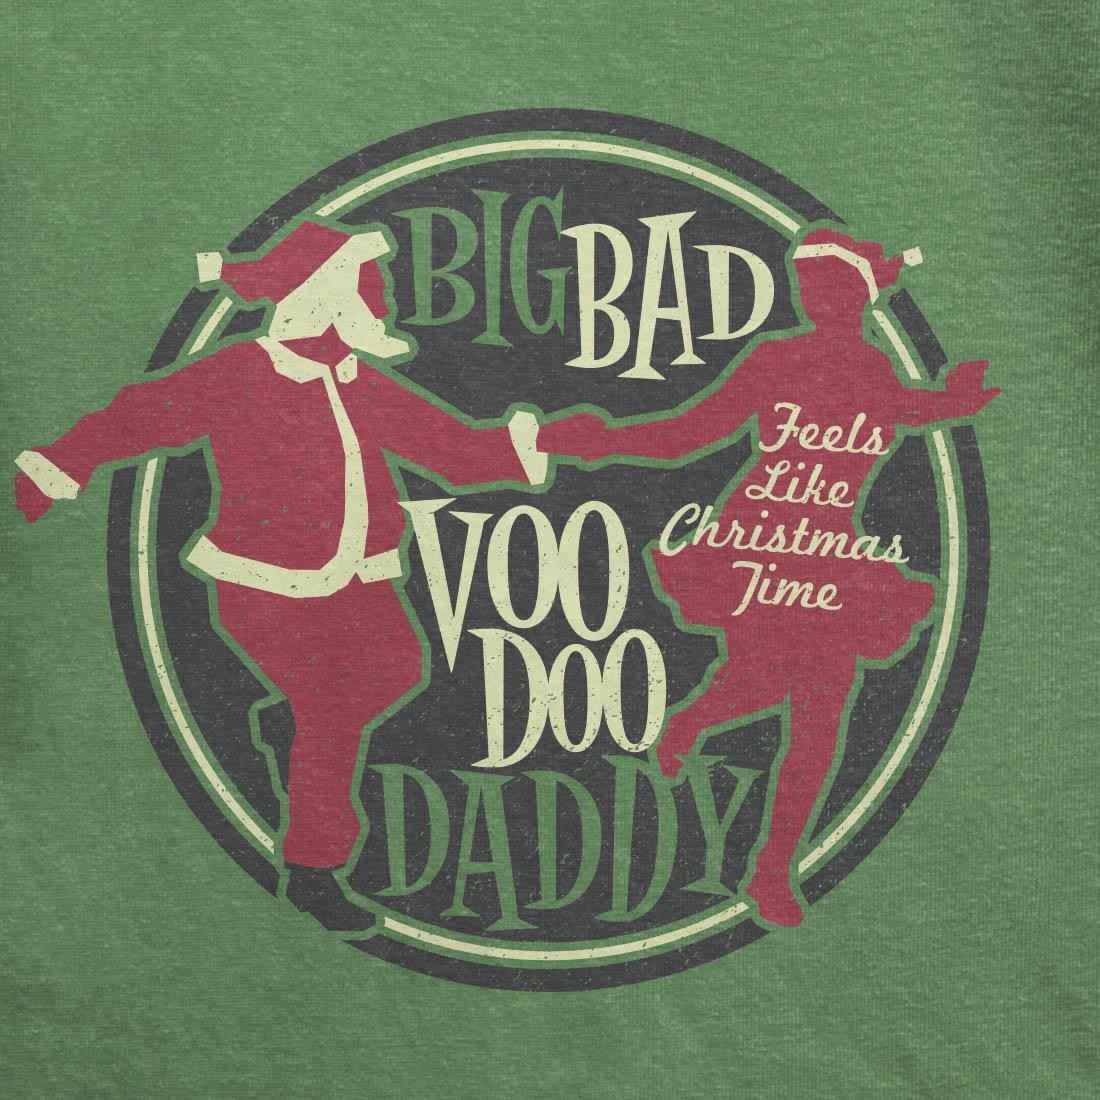 Tshirt-BigBadVoodooDaddy-Christmas